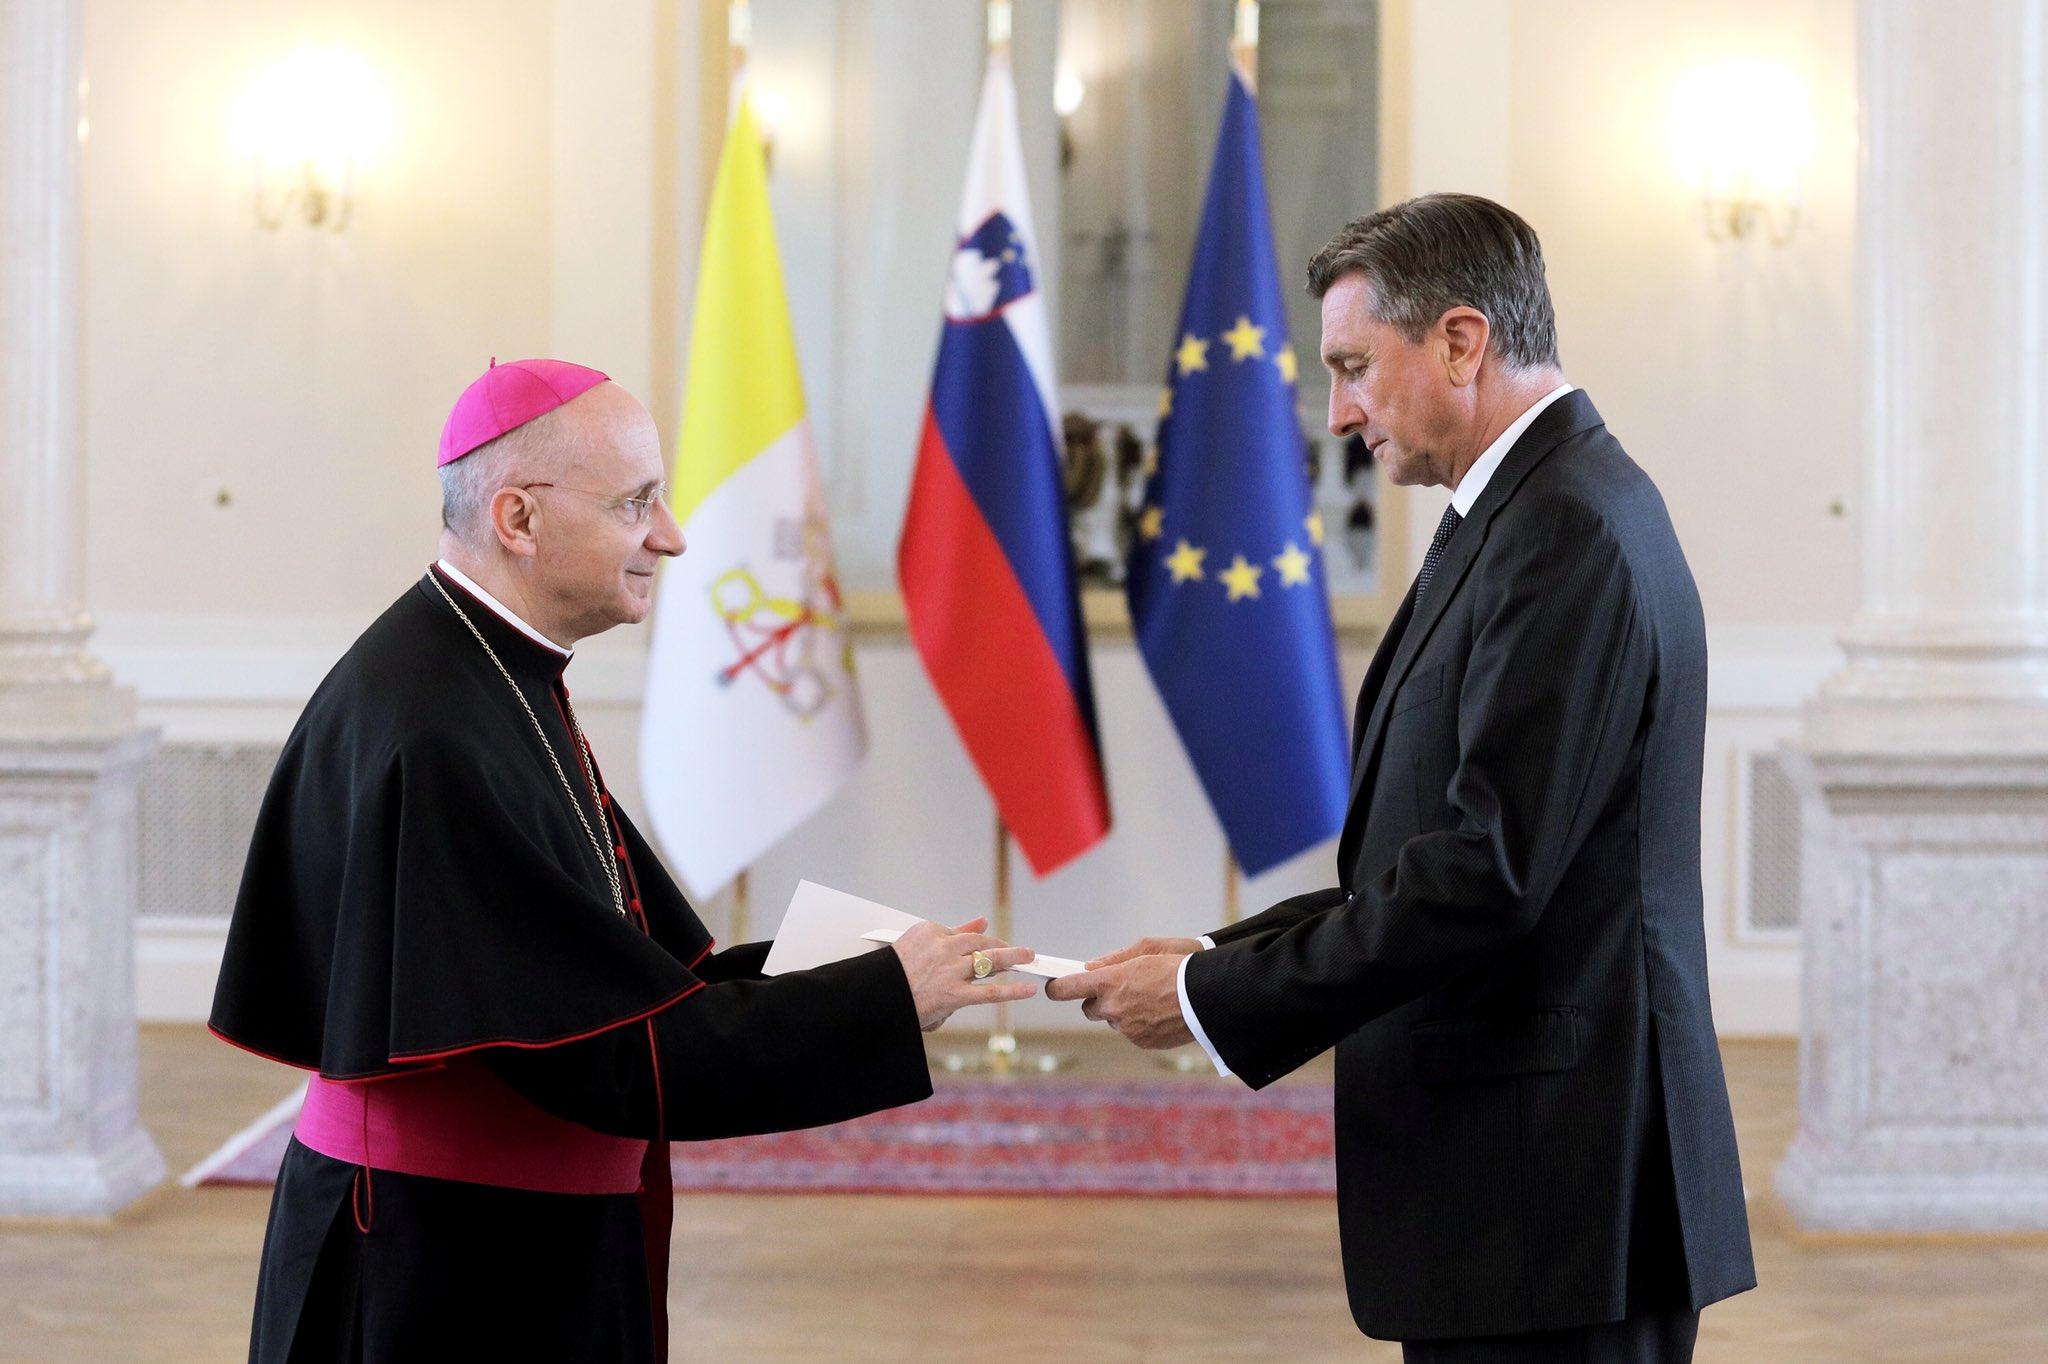 Apostolski nuncij nadškof mons. dr. Jean-Marie Speich predaja poverilna pisma slovenskemu predsedniku Borutu Pahorju (19. 6. 2019, foto: STA)